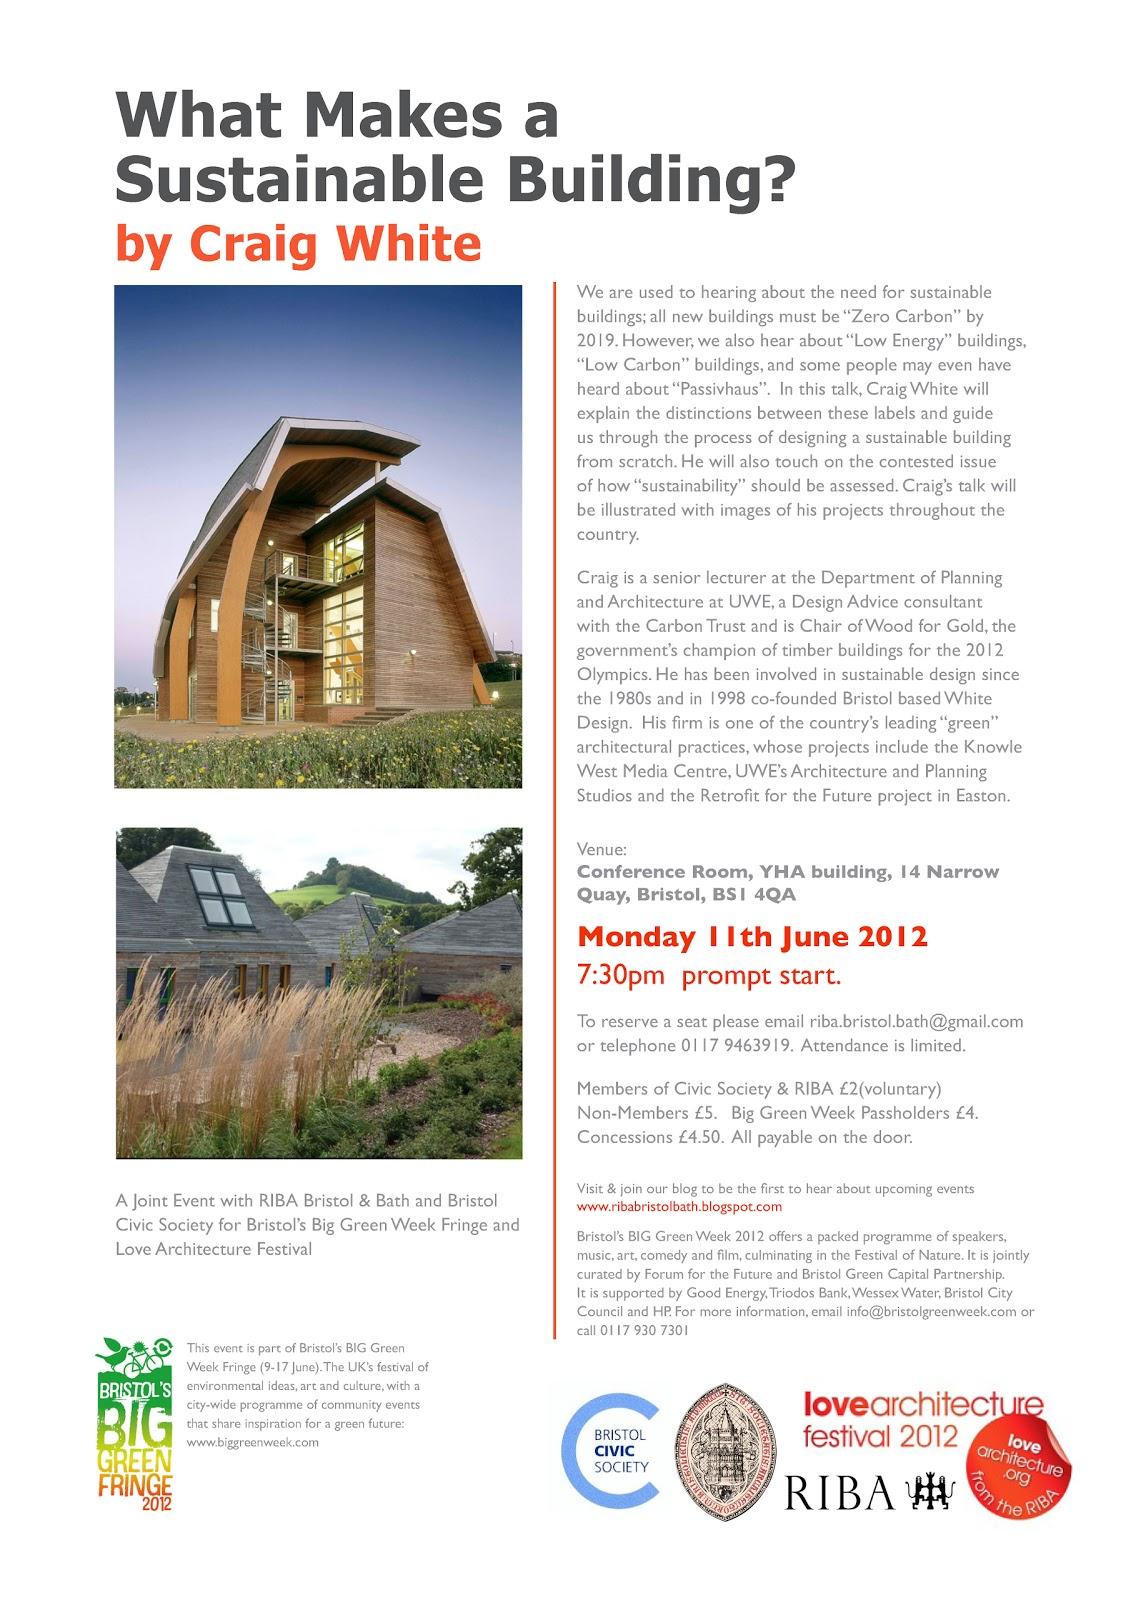 Riba Bristol And Bath The Bristol Society Of Architects